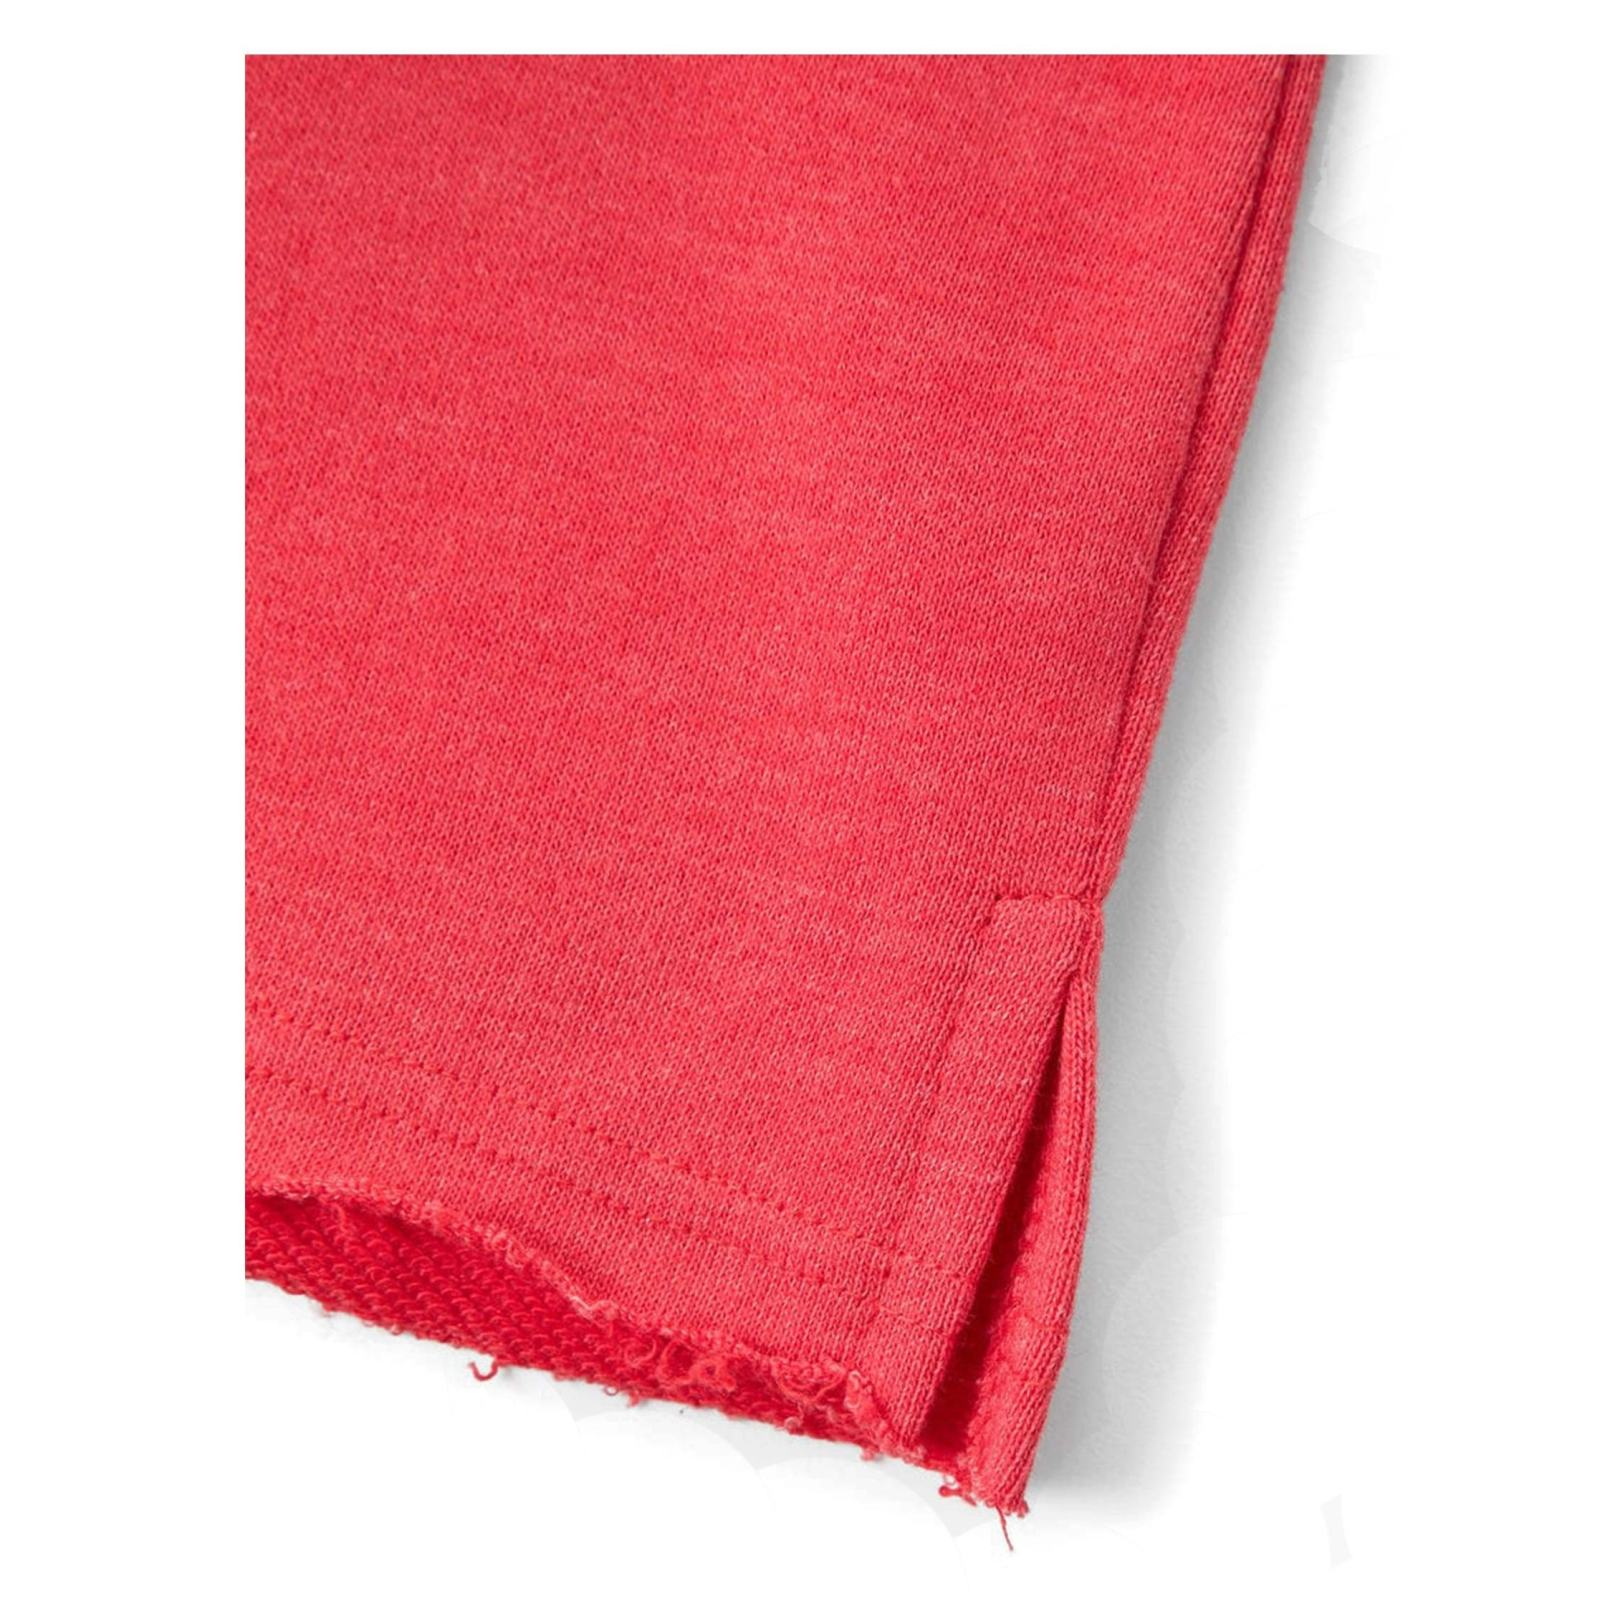 سویشرت نخی جلو بسته دخترانه - مانگو - قرمز - 4